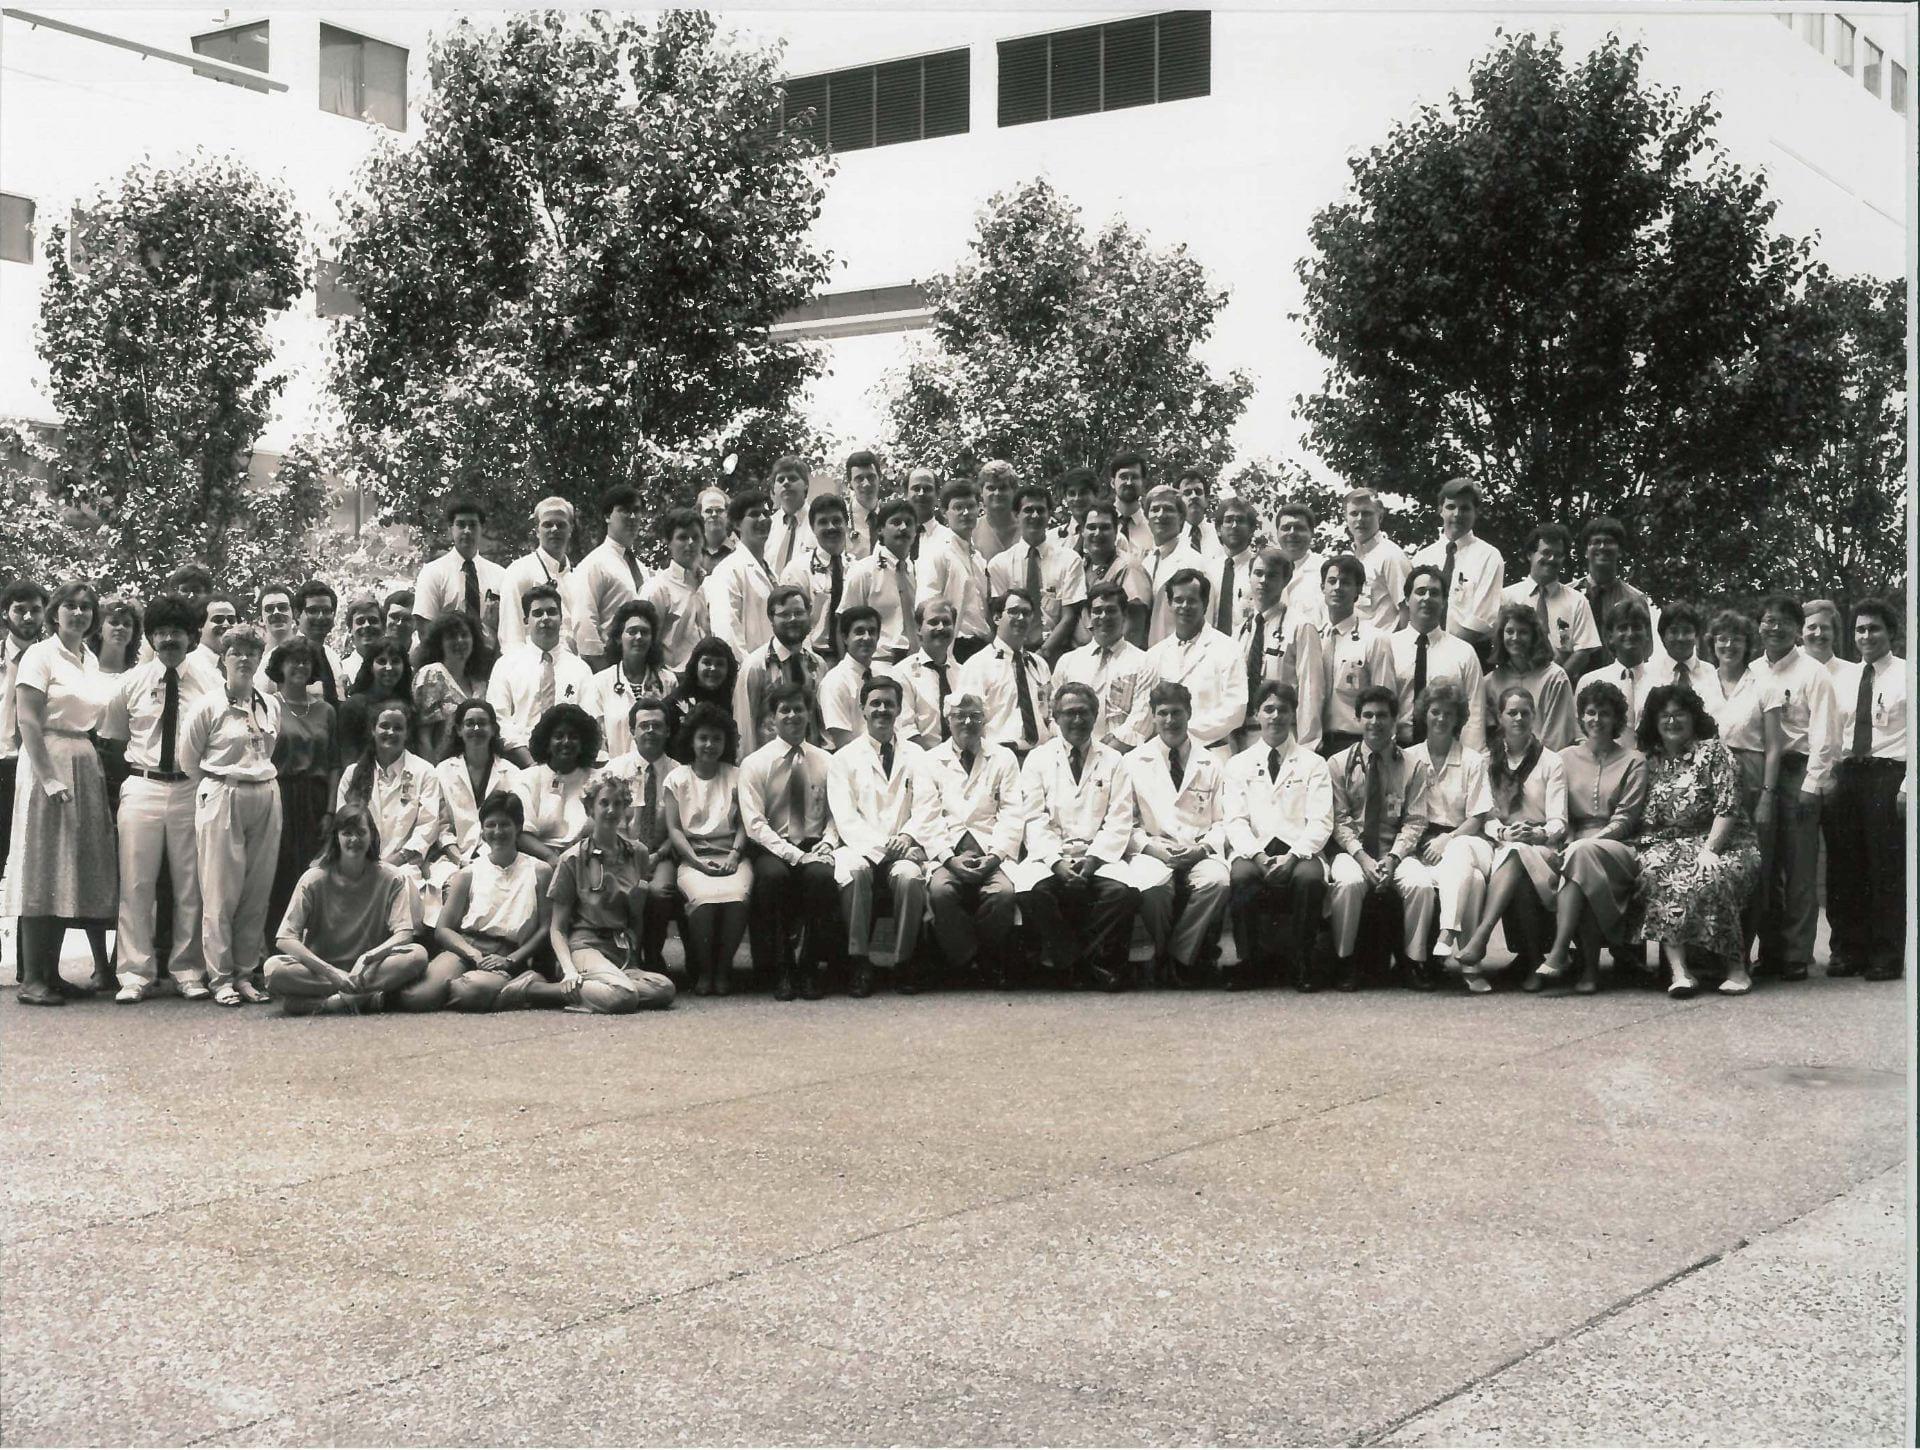 1988 Housestaff Photo